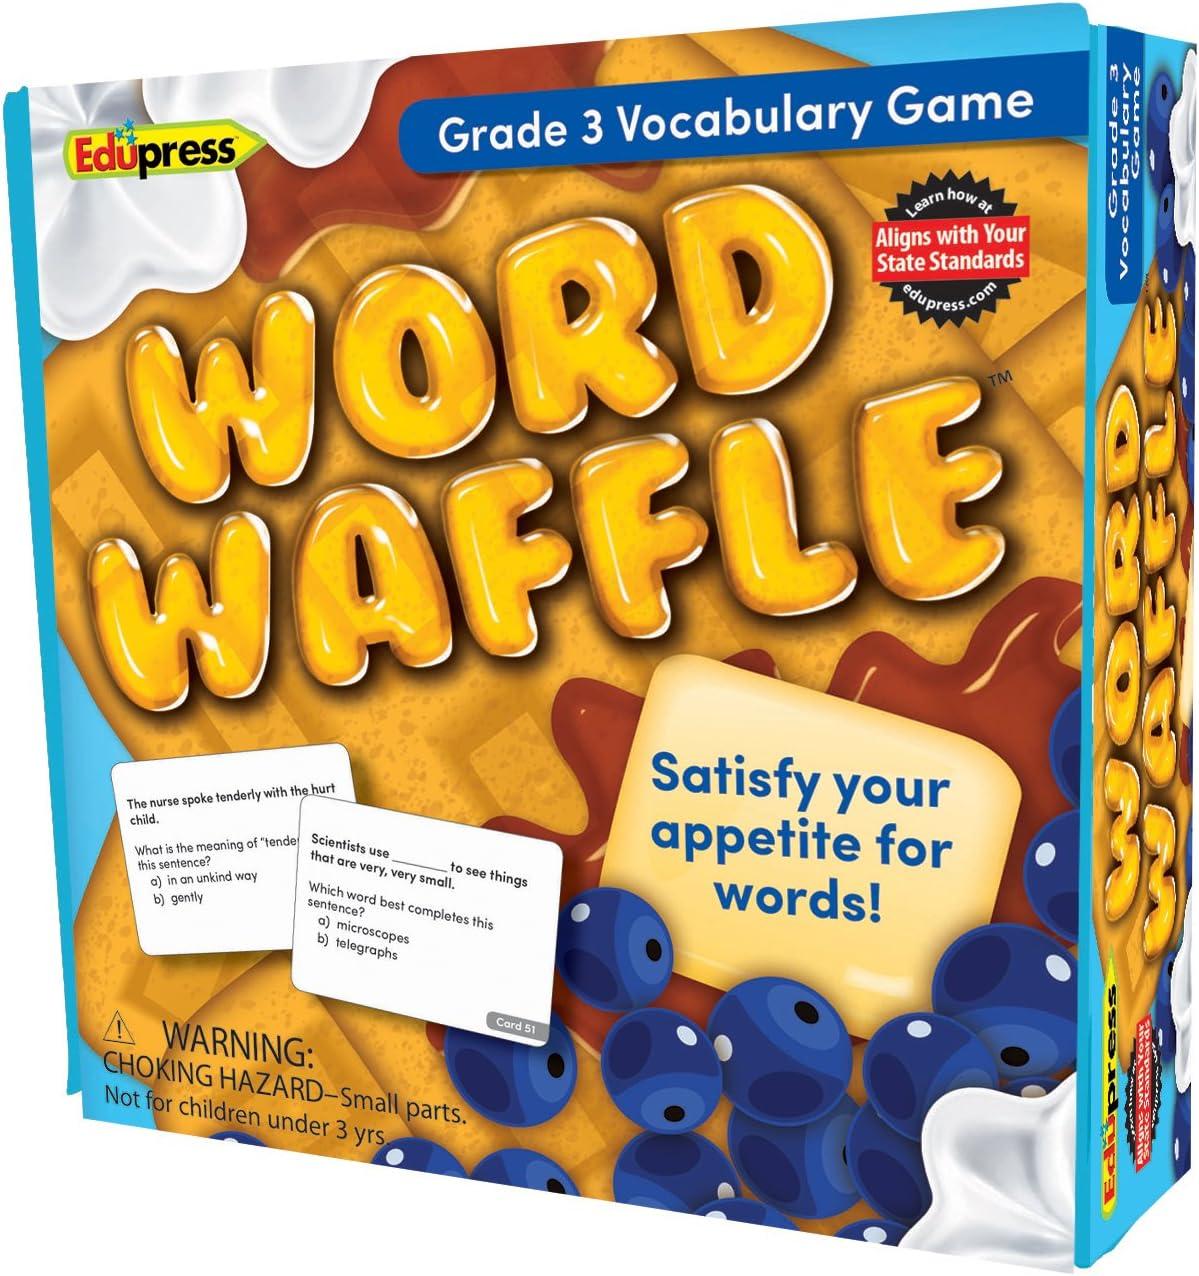 World Waffle game box.